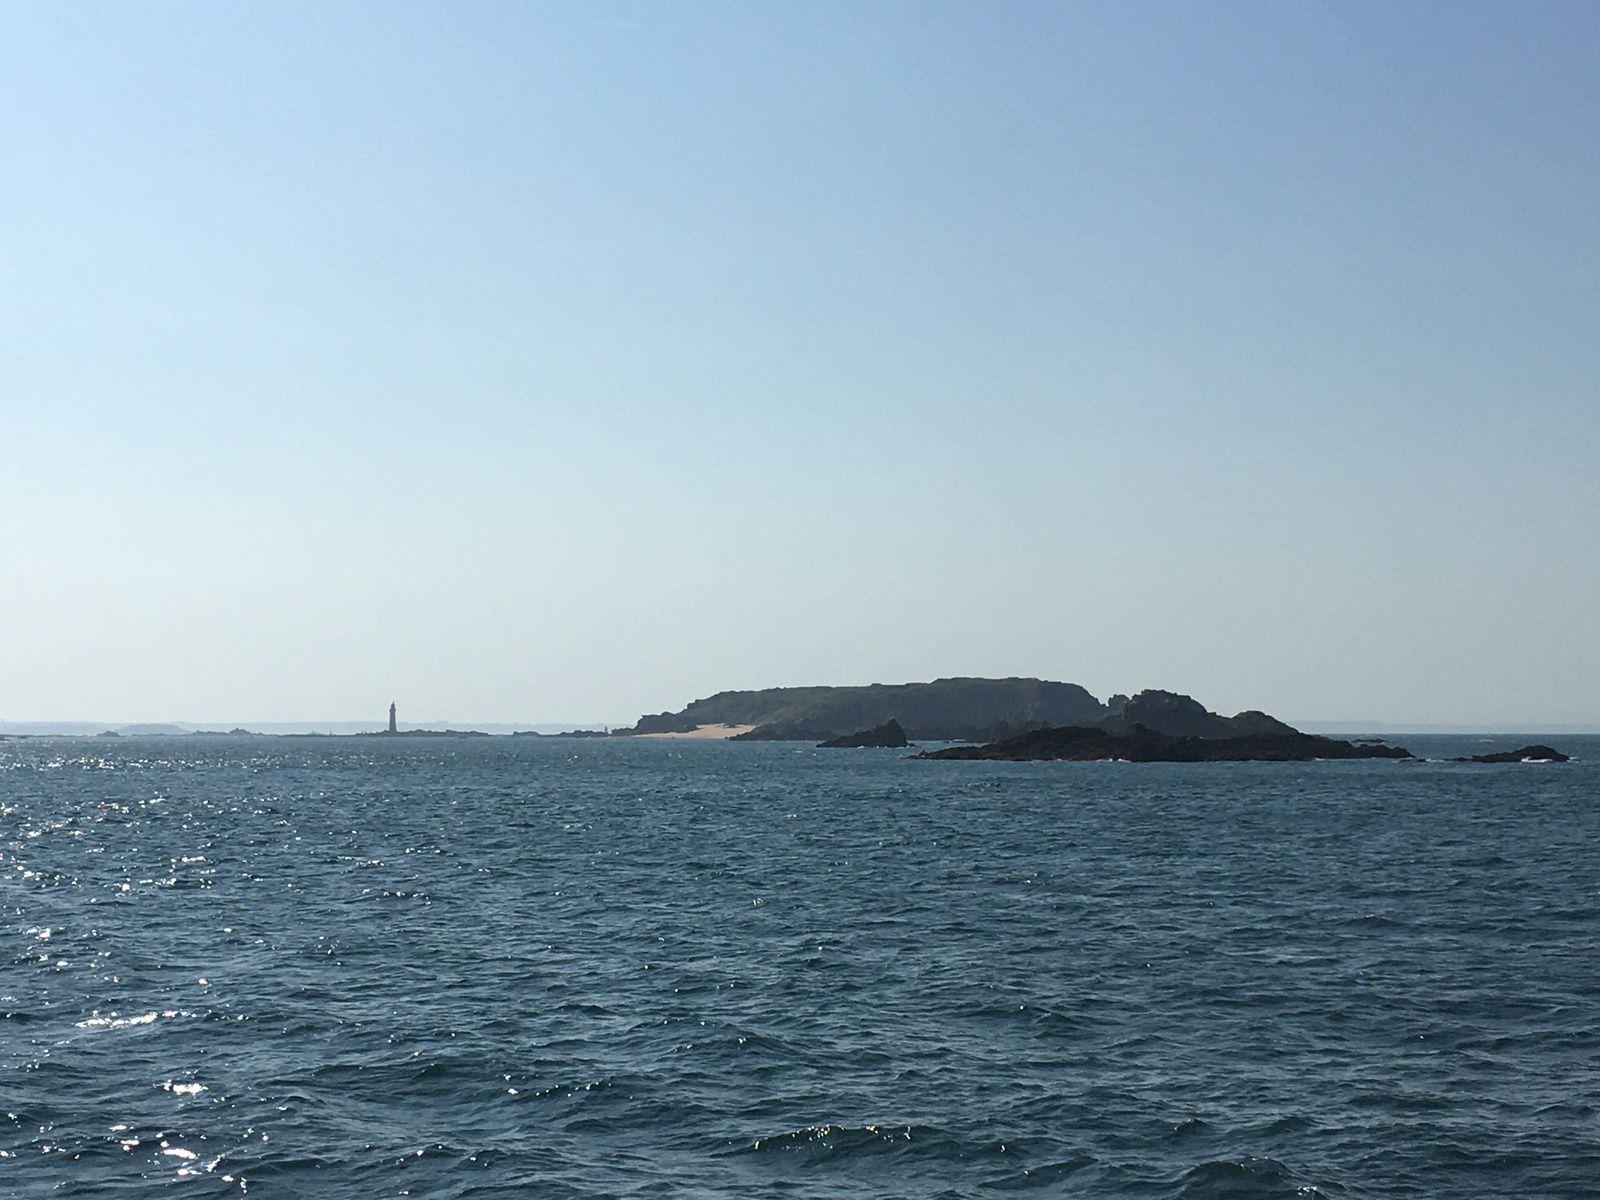 17 septembre 2020 : Dinard / Baie de Saint-Malo